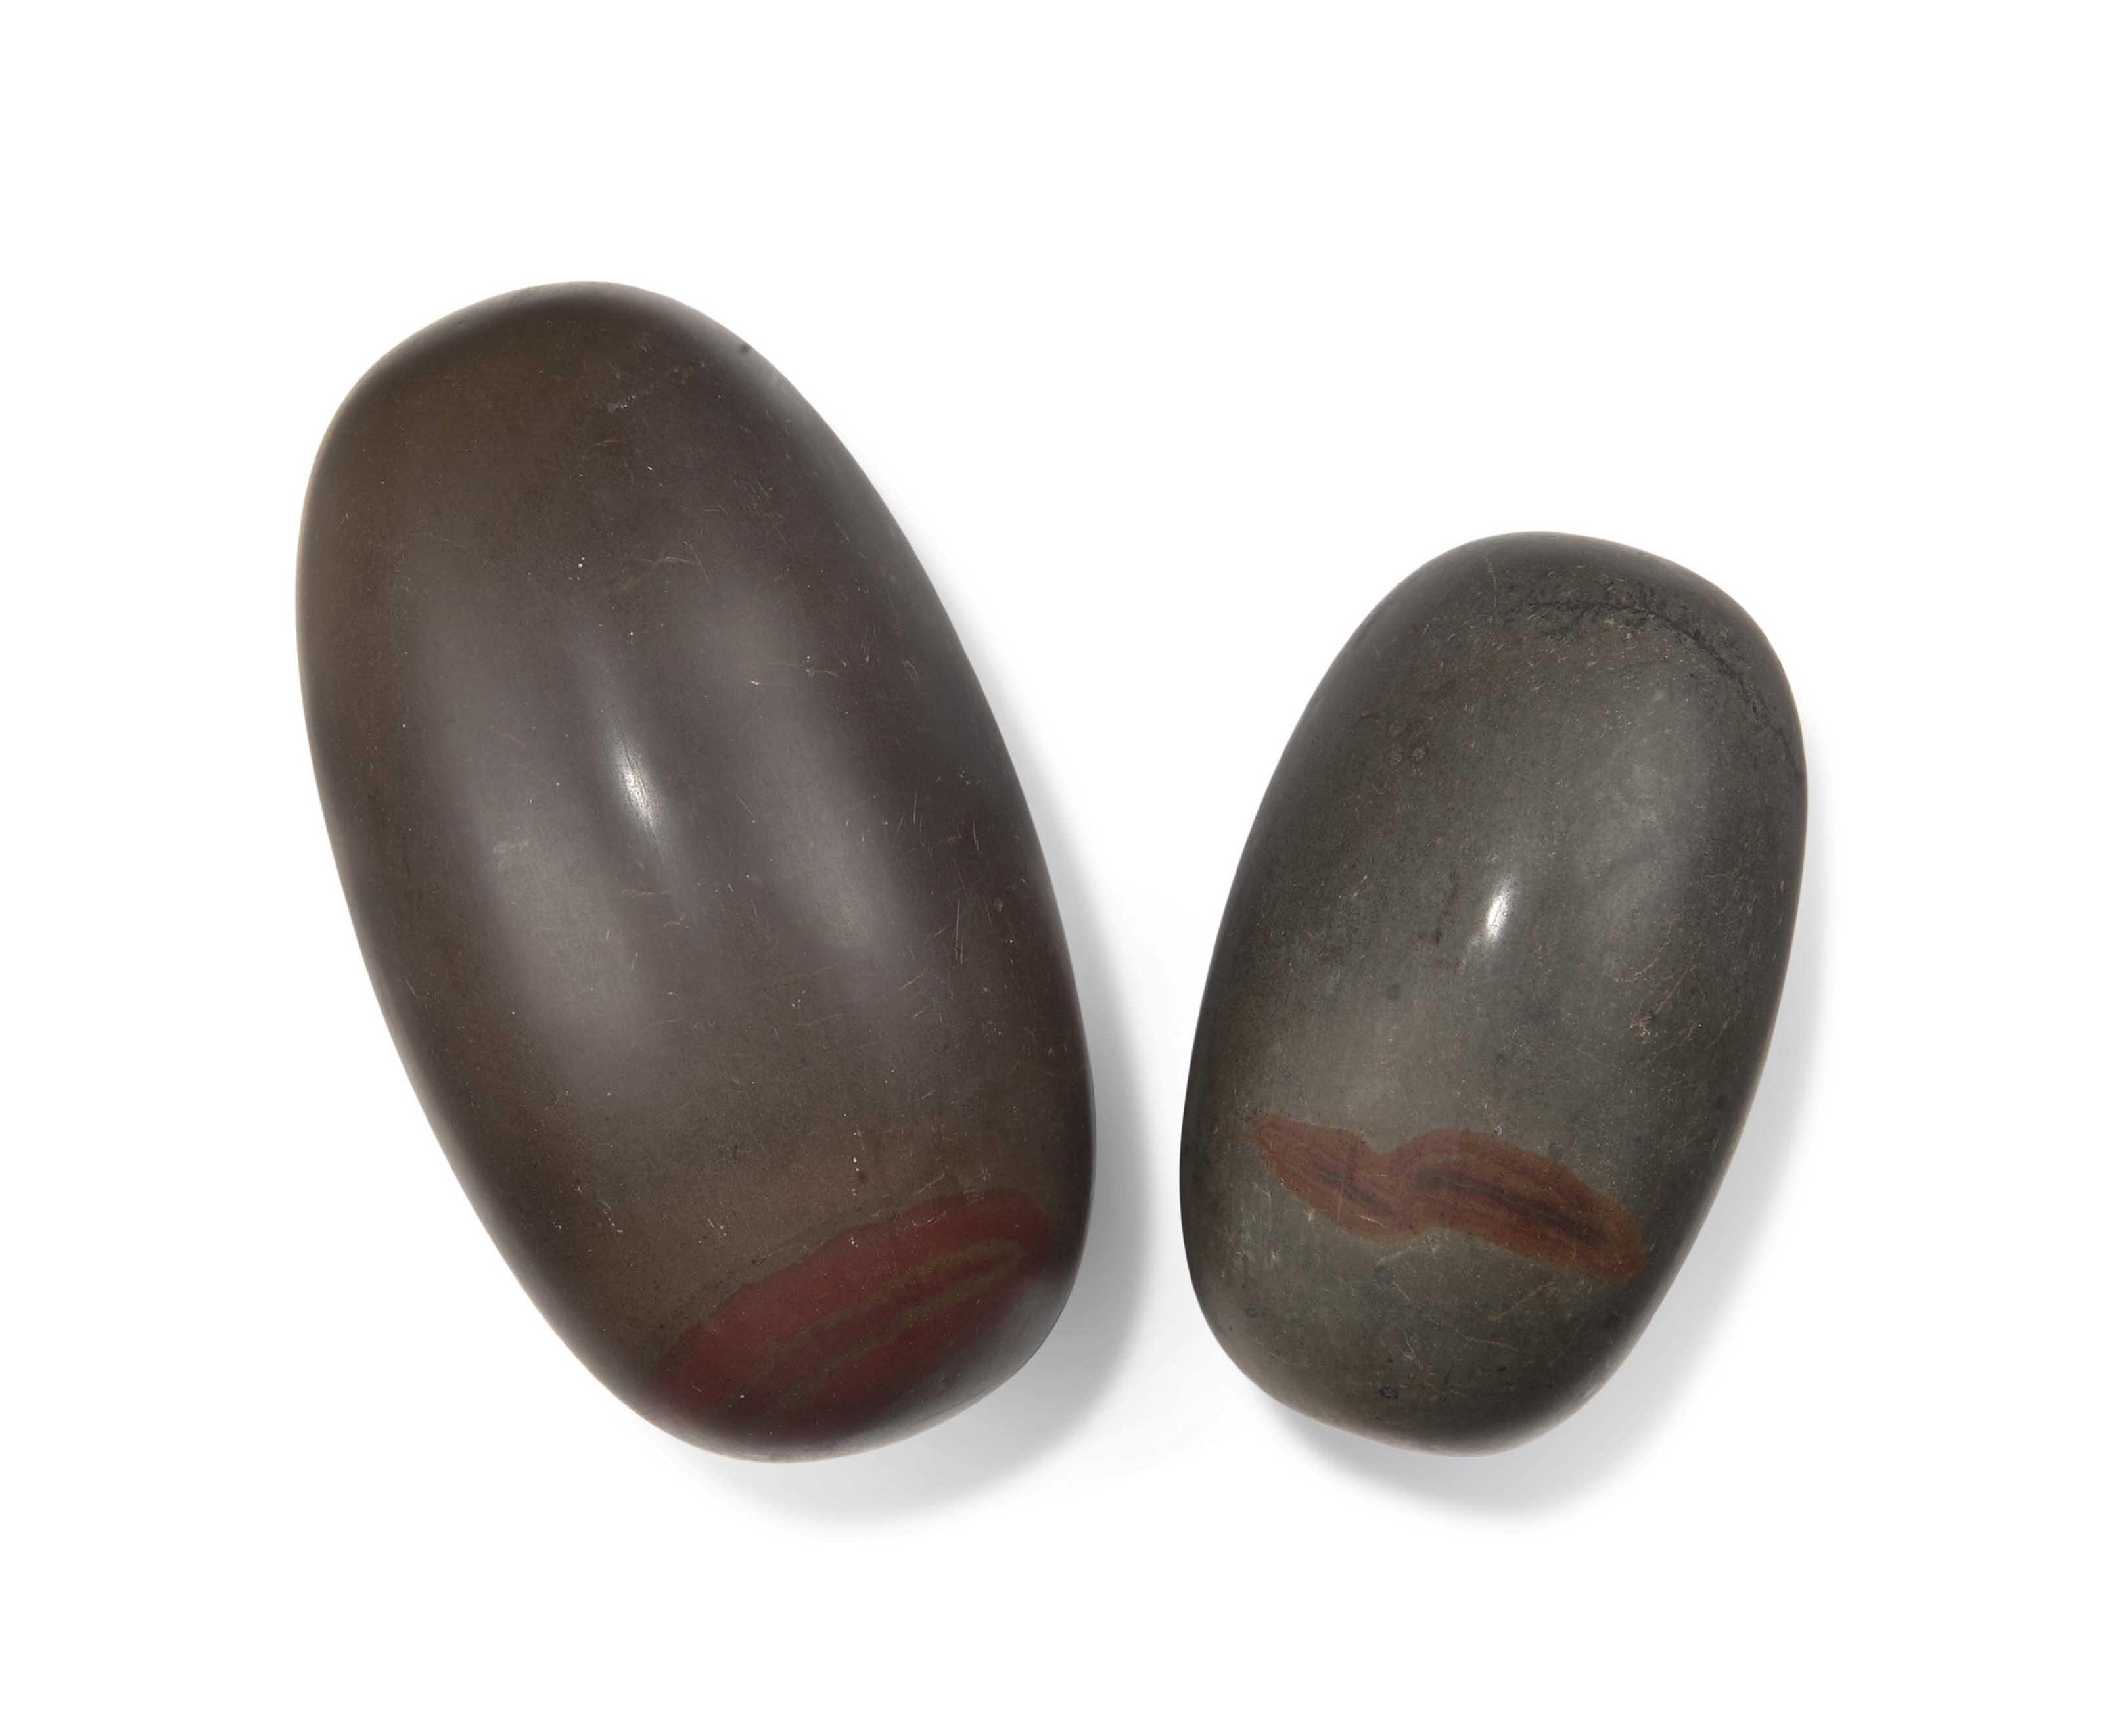 TWO LINGAM STONES